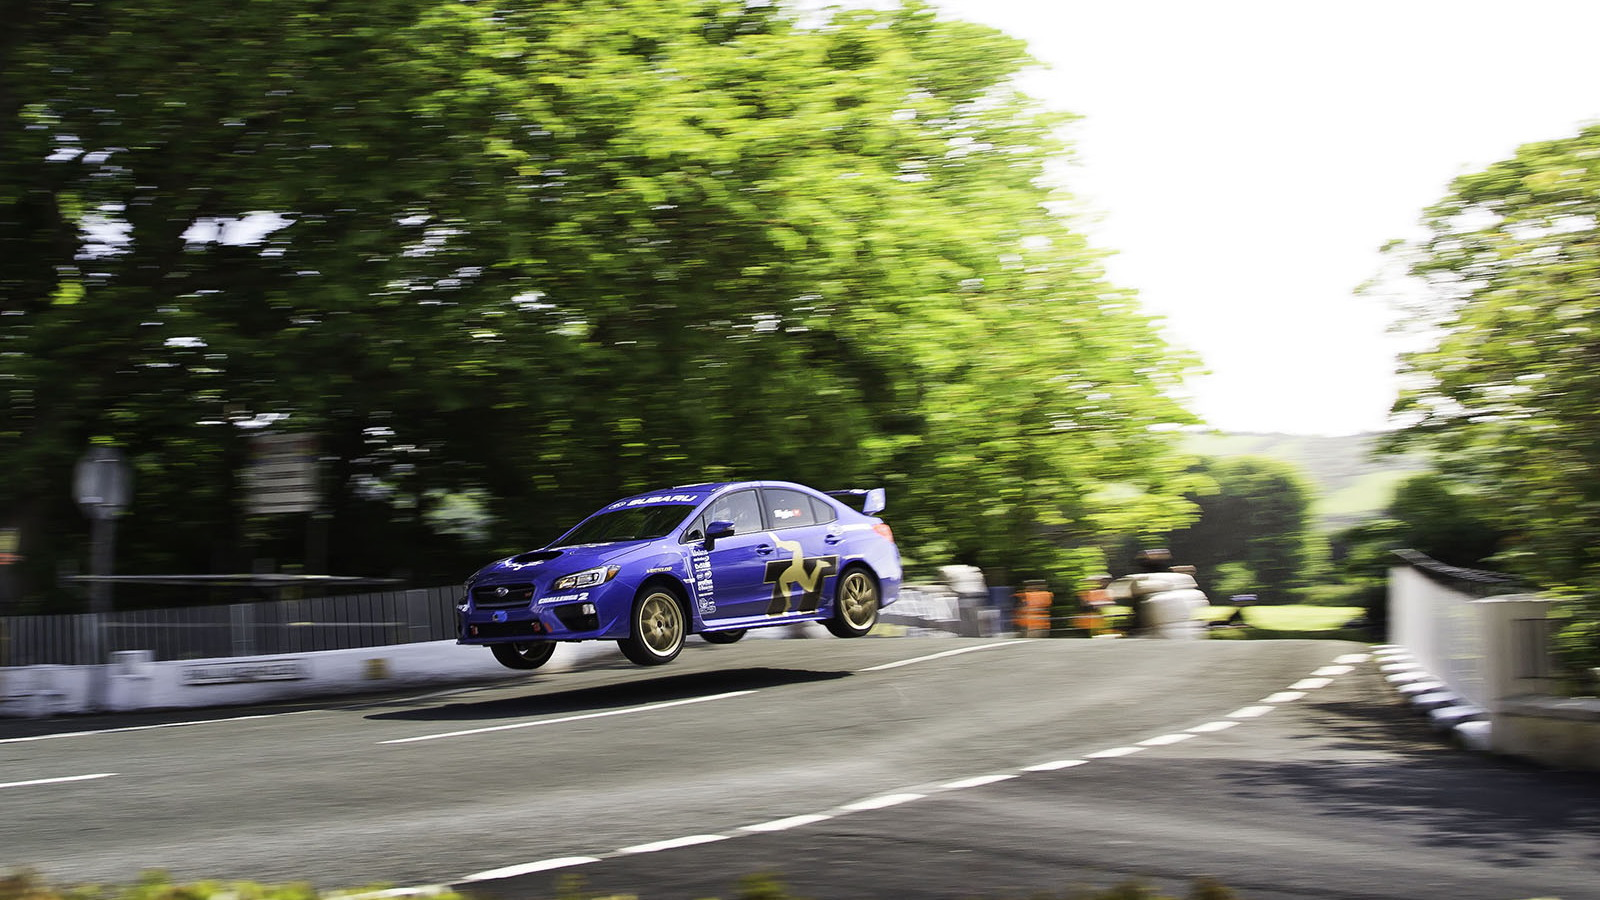 2015 Subaru WRX STI Sets New Isle Of Man TT Car Lap Record